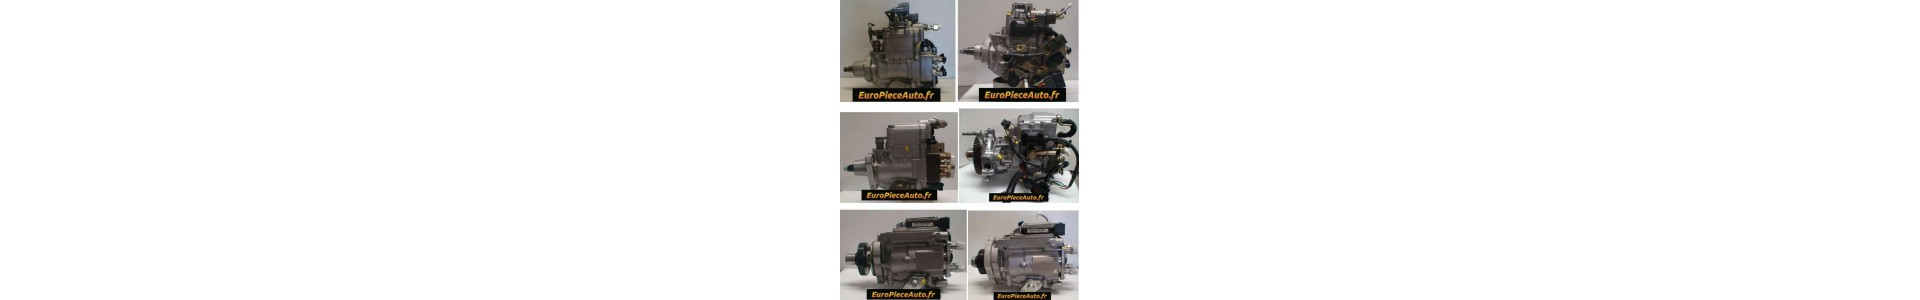 Test pompe injection Diesel